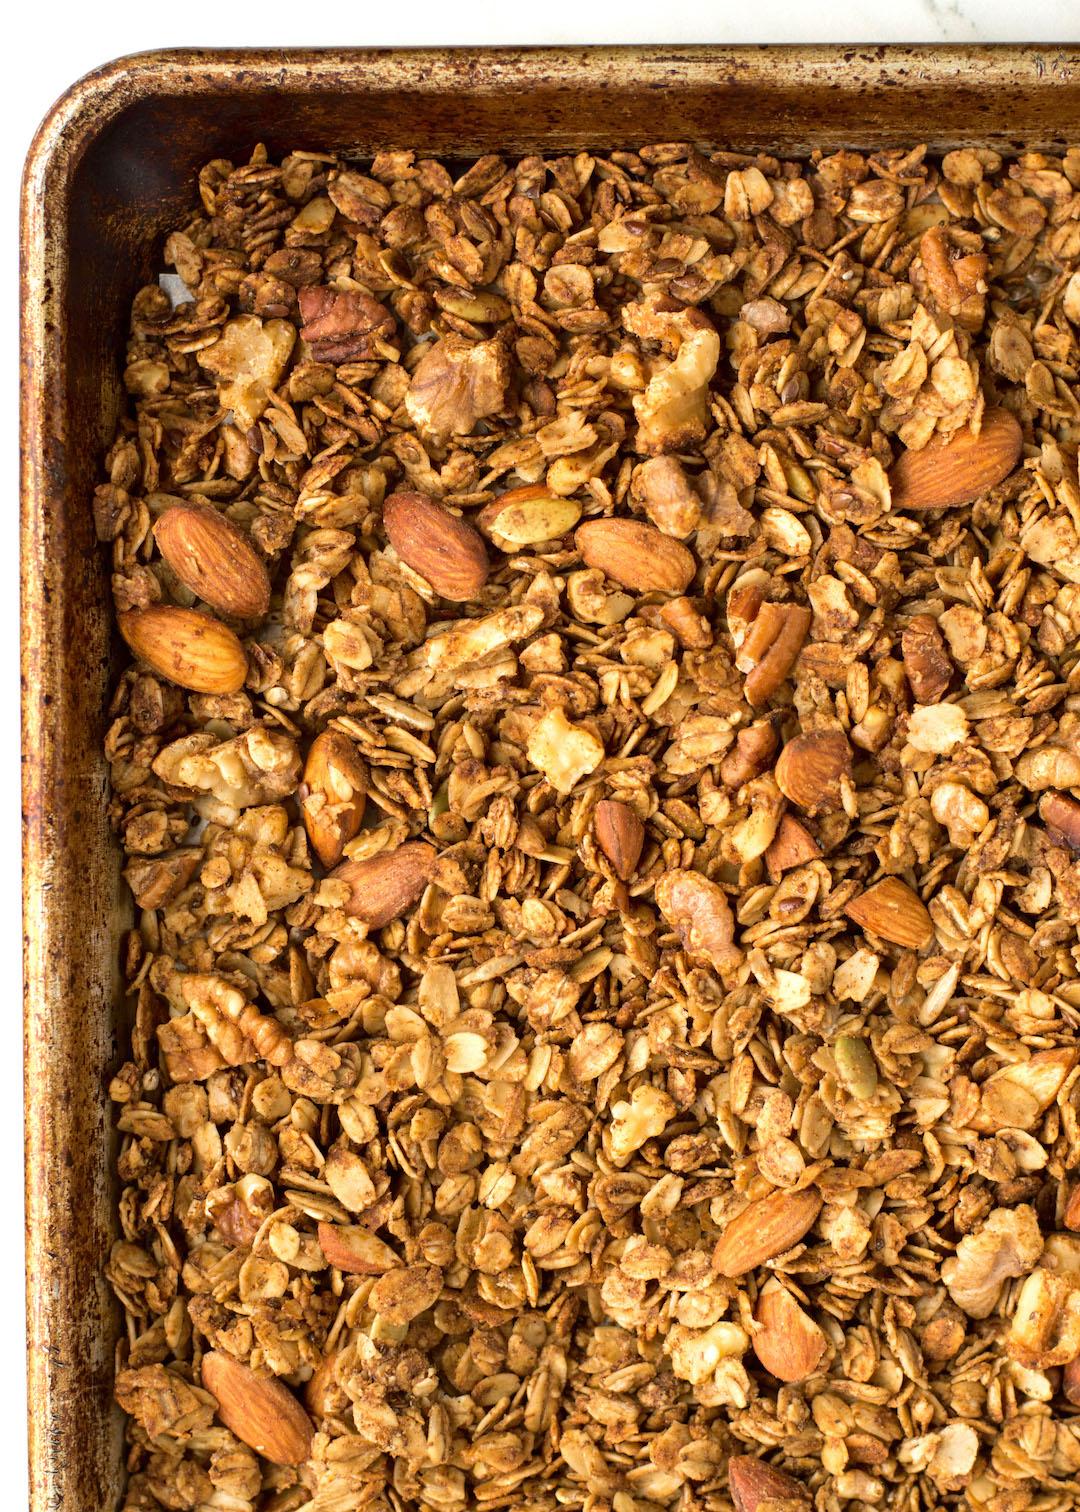 Superfood Gingerbread Granola   breakfast   granola   recipe   superfood, super seeds, nuts and seeds   gluten free, dairy free, vegan possible   gingerbread recipe   festive breakfast